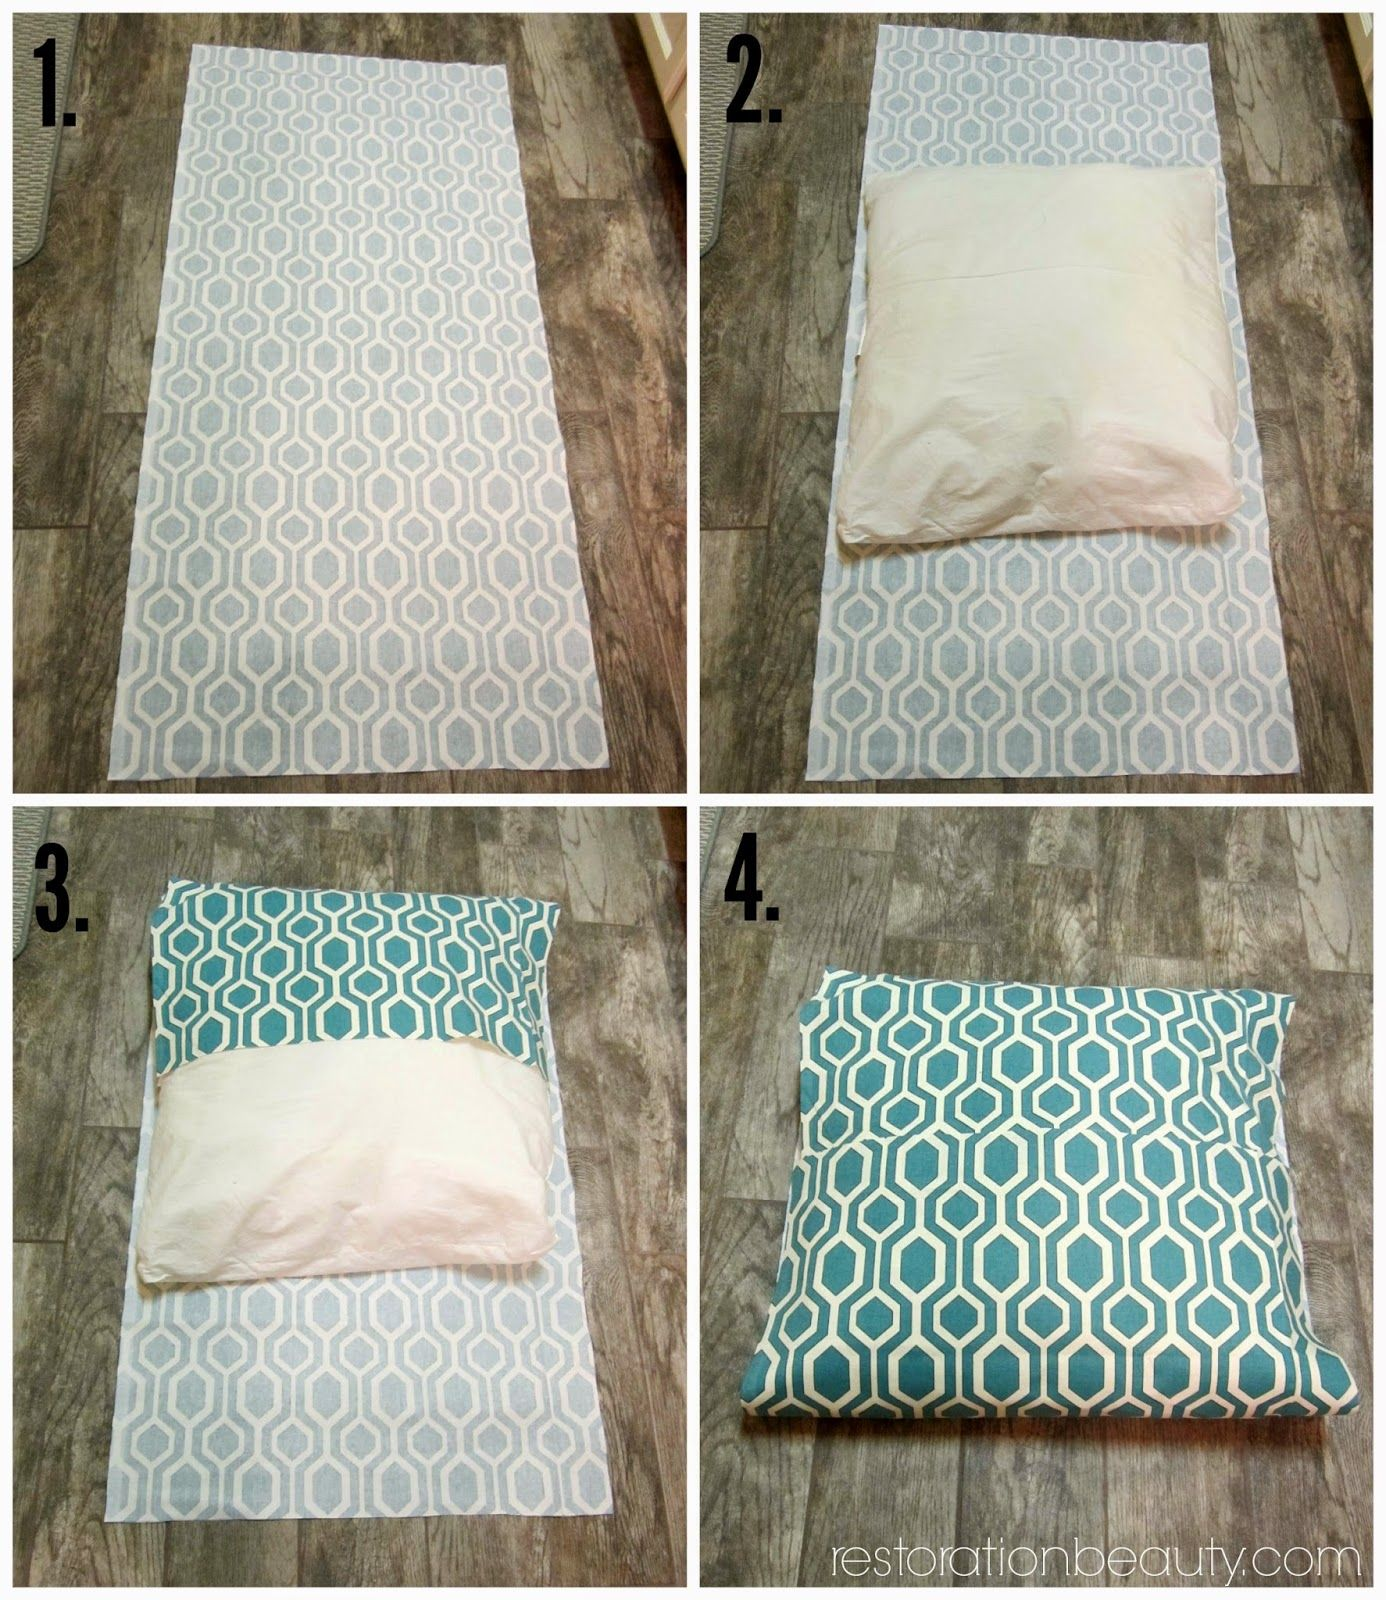 Easier Than Ever No Sew Floor Pillows Pillow Cases Diy Diy Pillow Covers Diy Throw Pillows